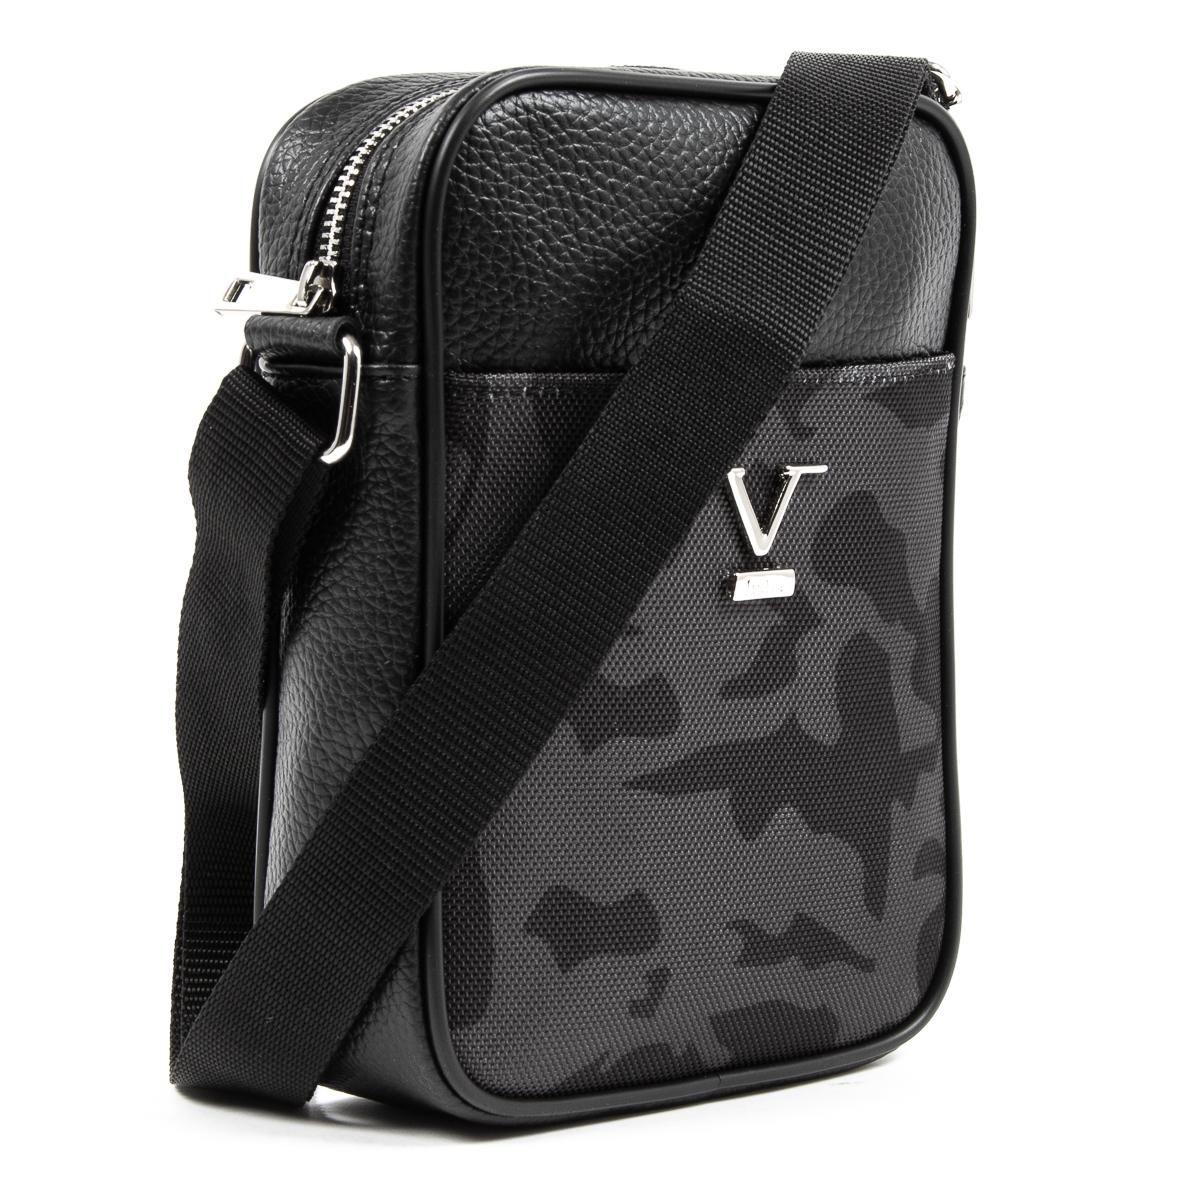 Versace 19-69 Woman/'s  Shoulder Bag Red